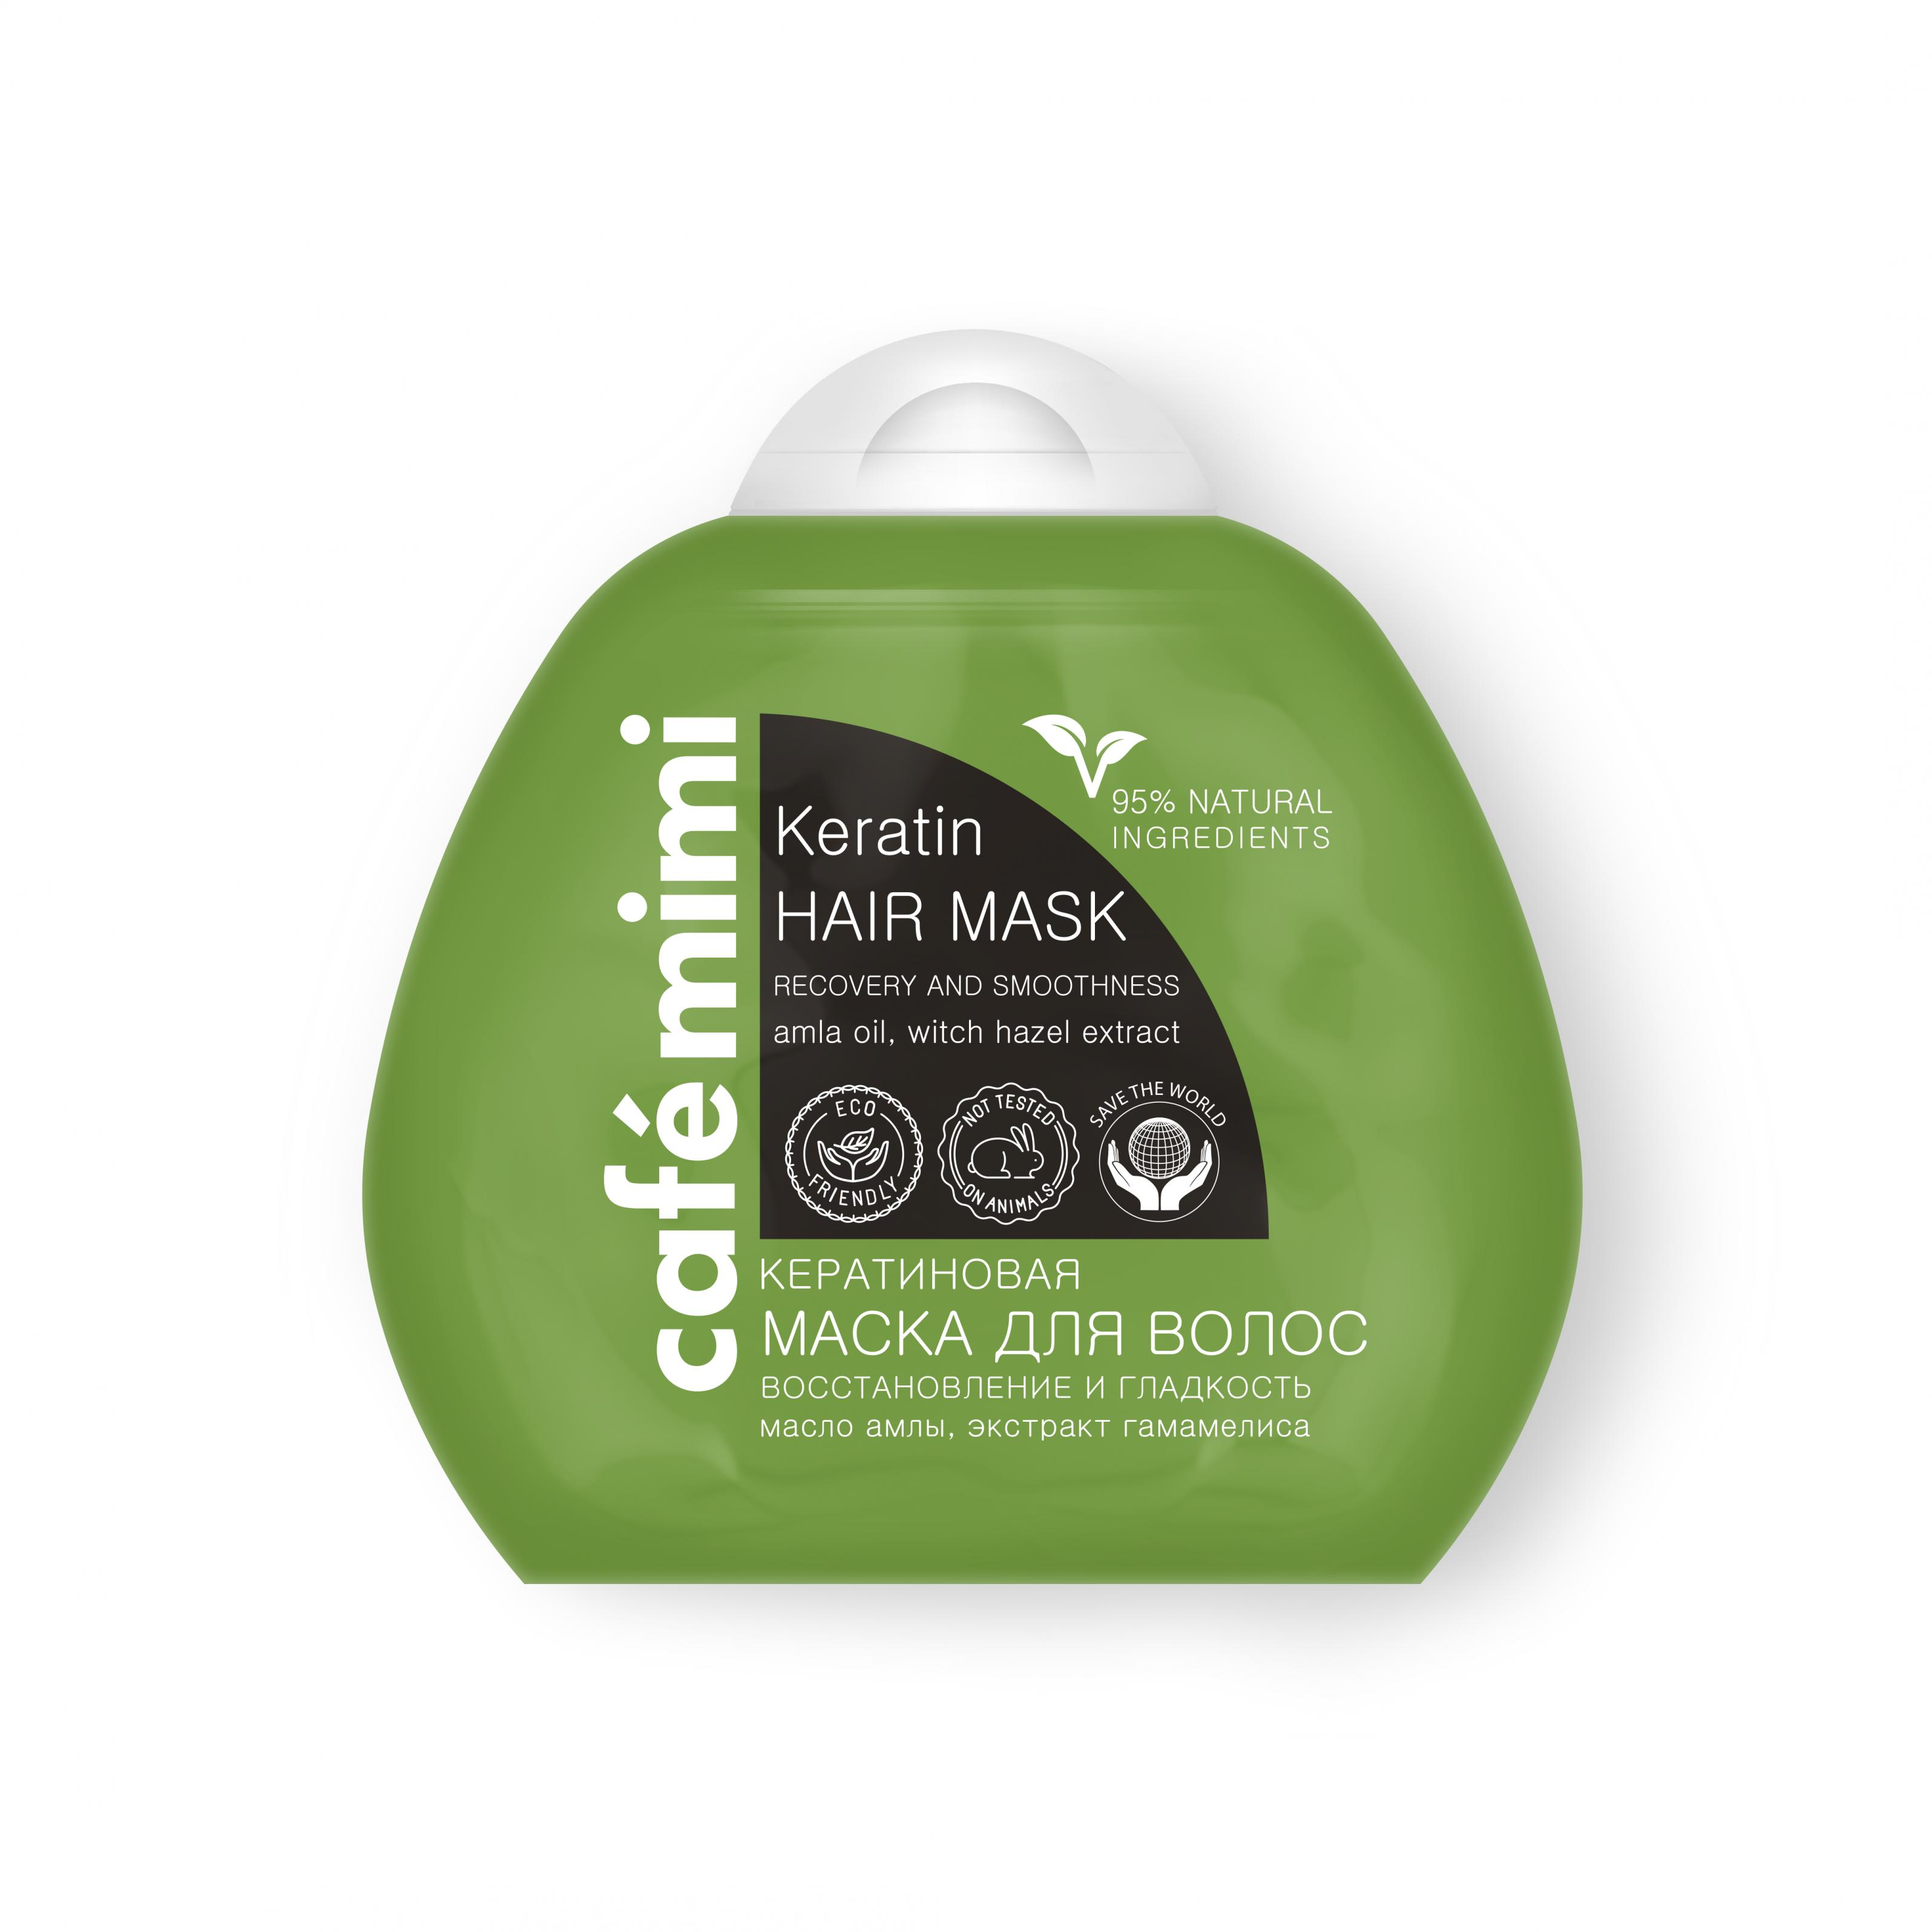 Café Mimi Mascarilla Capilar de Queratina  100 ml